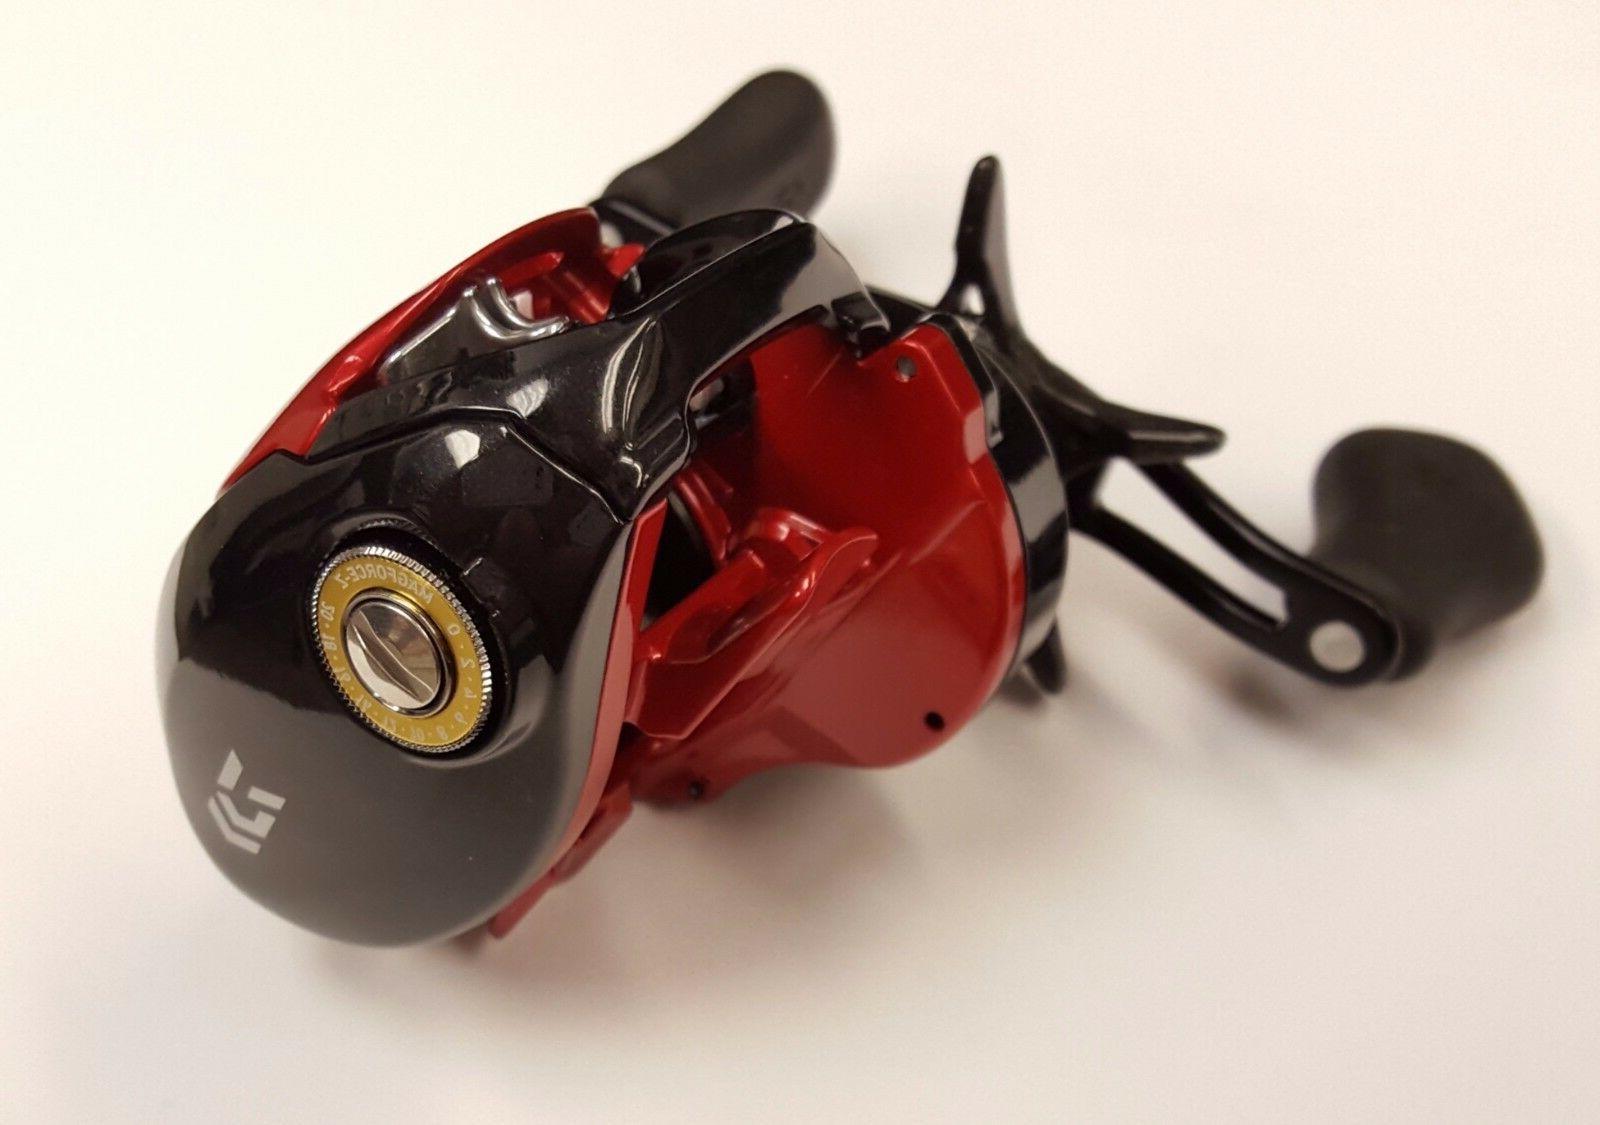 Daiwa 100H Baitcast Fishing Reel TACT-R100H